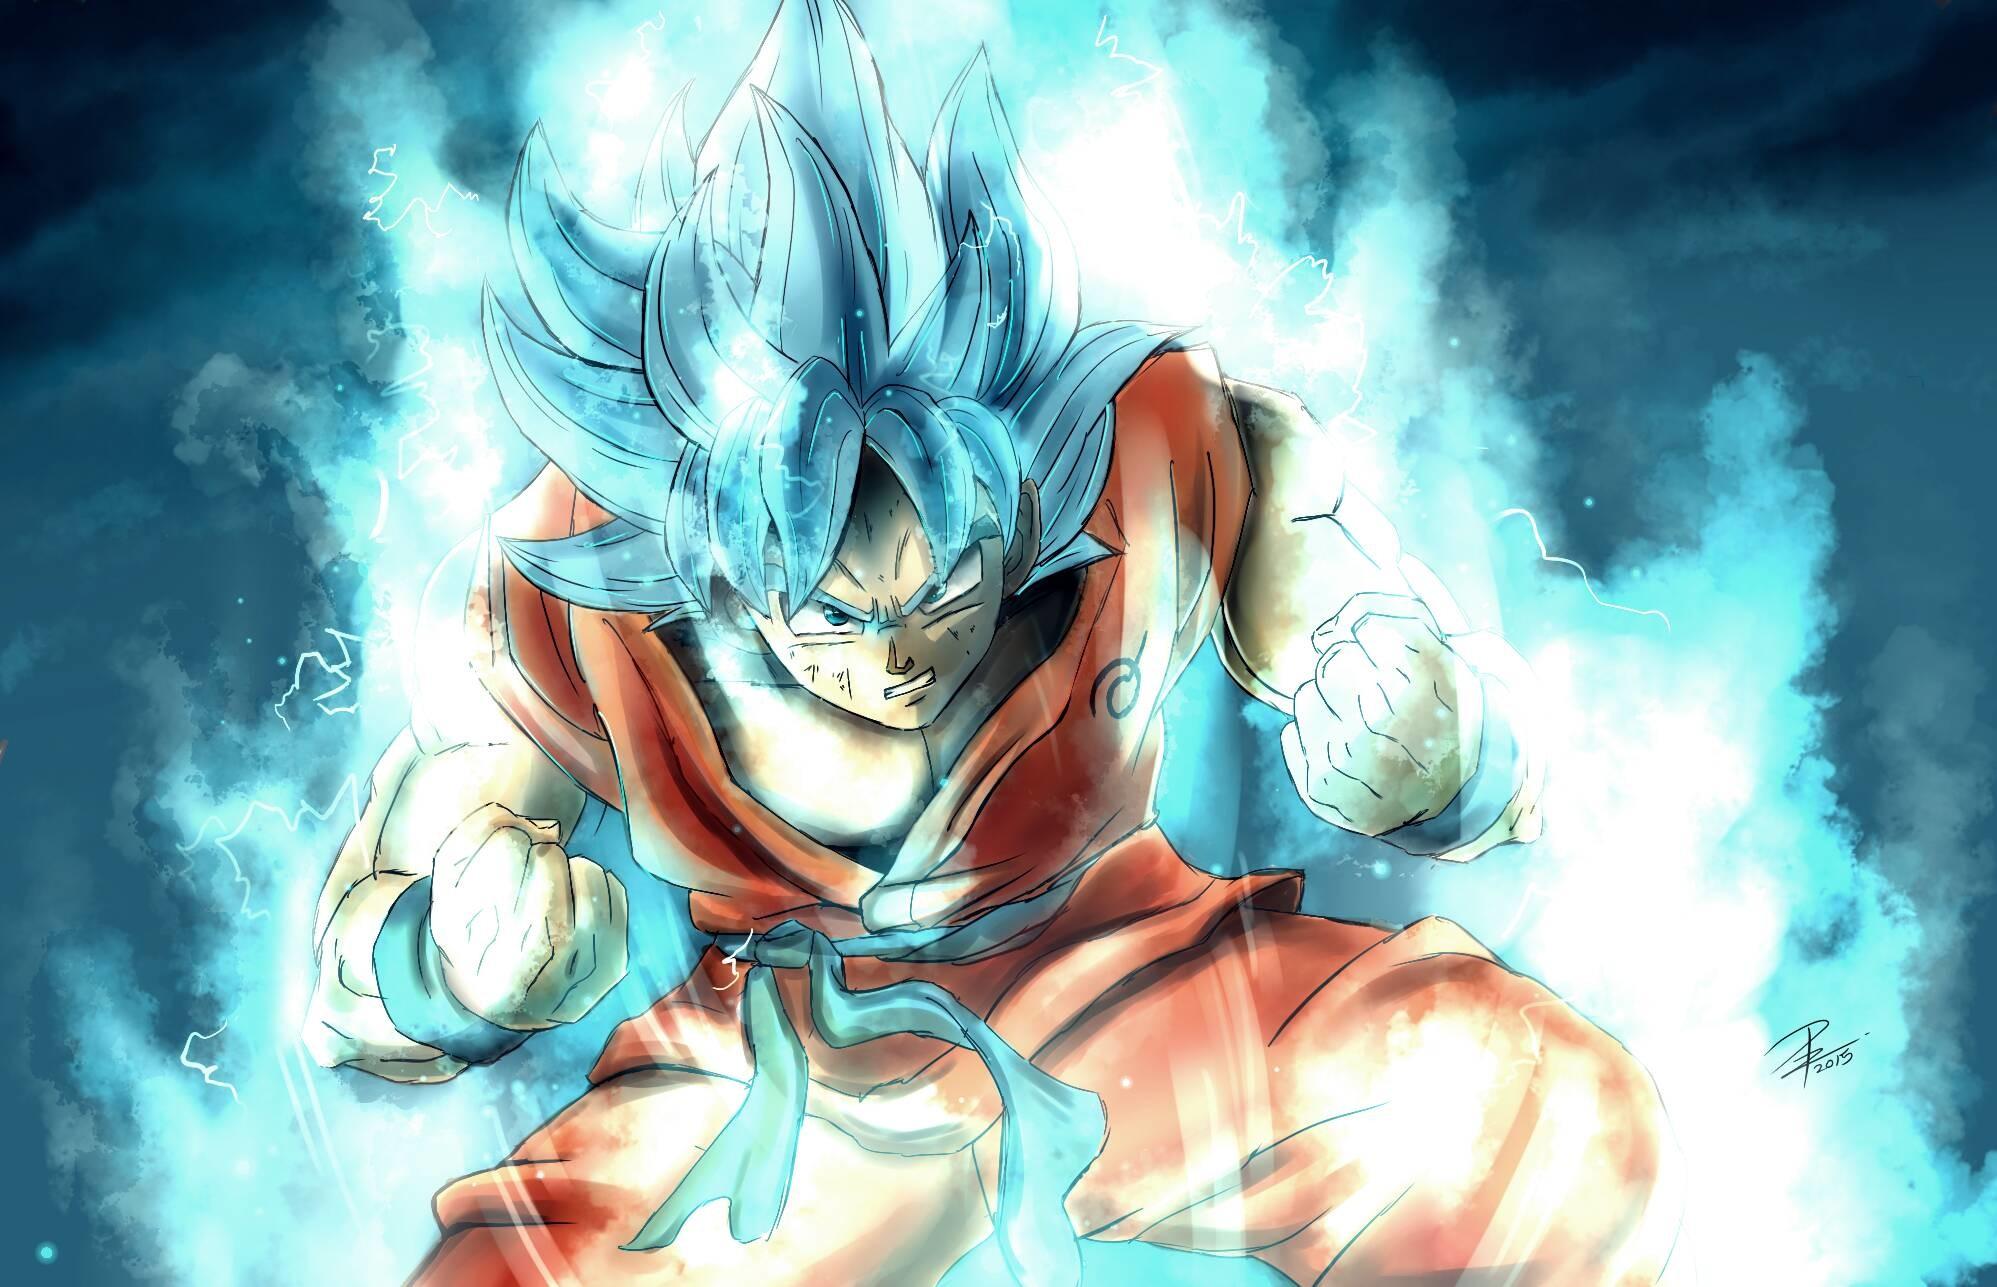 Wallpaper Of Goku 80 Images